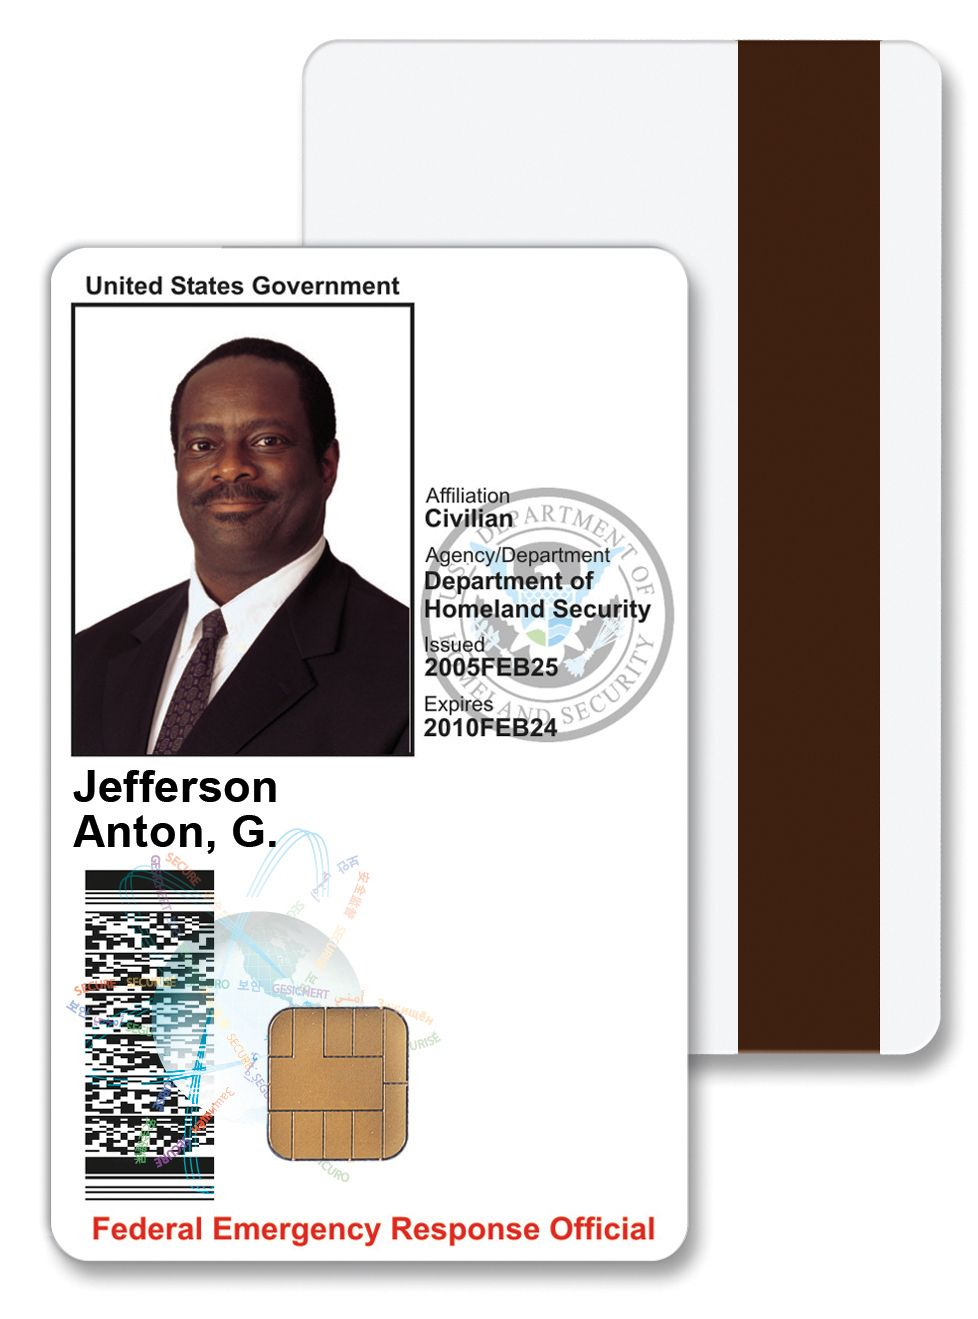 Http fargo mexico tecnosmart com impresoras credencial de identidad para